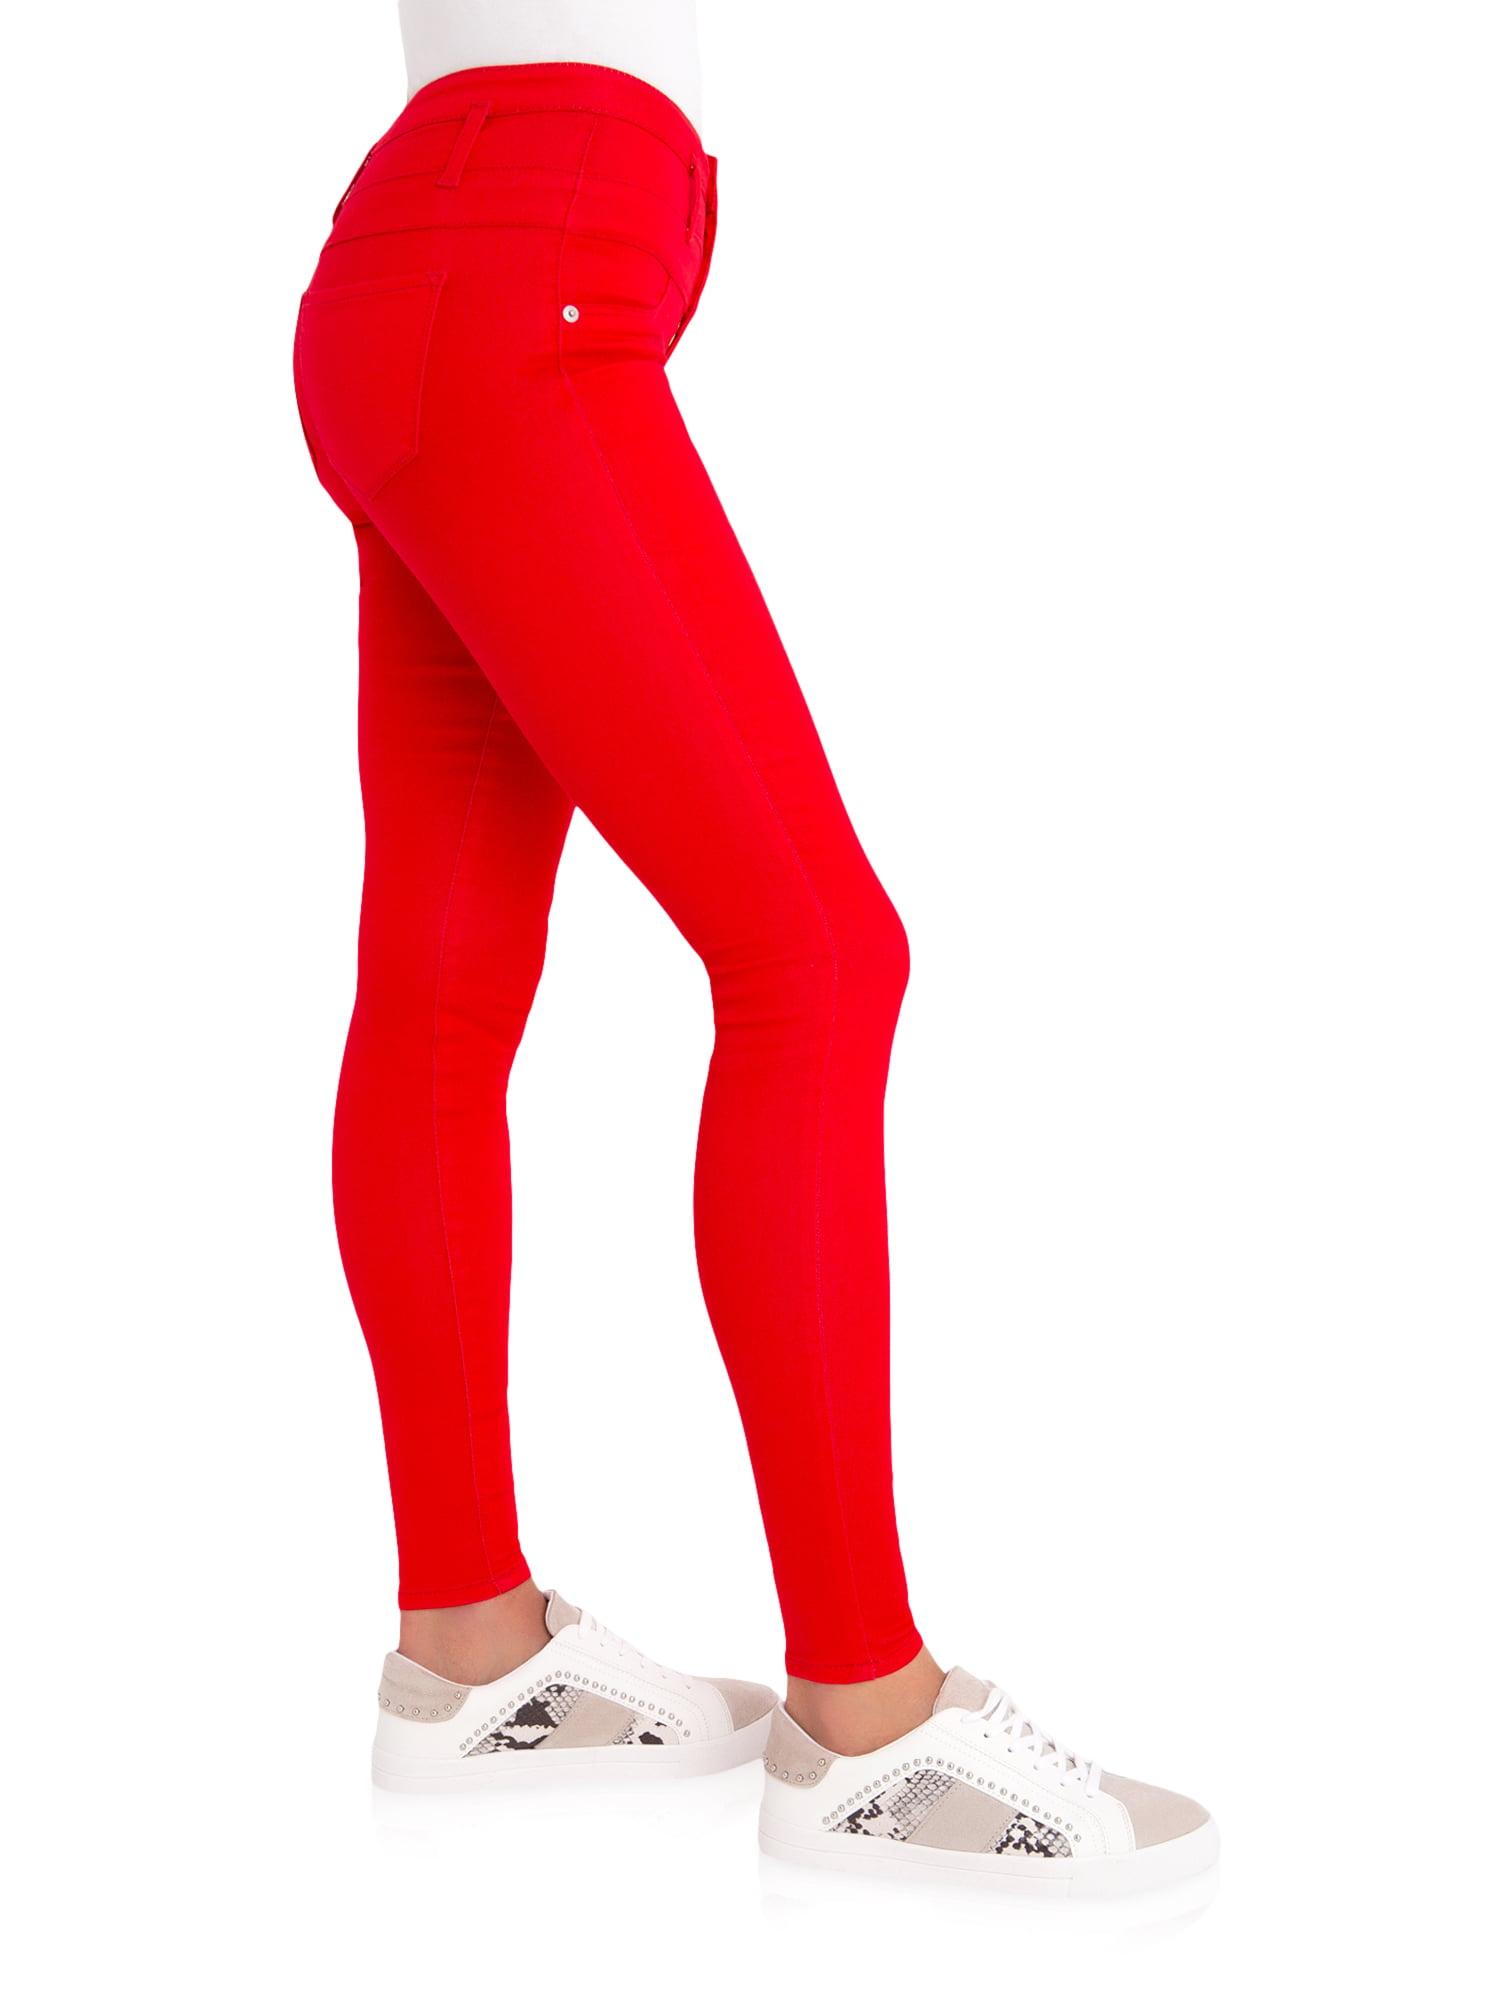 Dorathy juniors black leggings Galaxy Print 3d Cute Fitness Skinny Sport Clothing